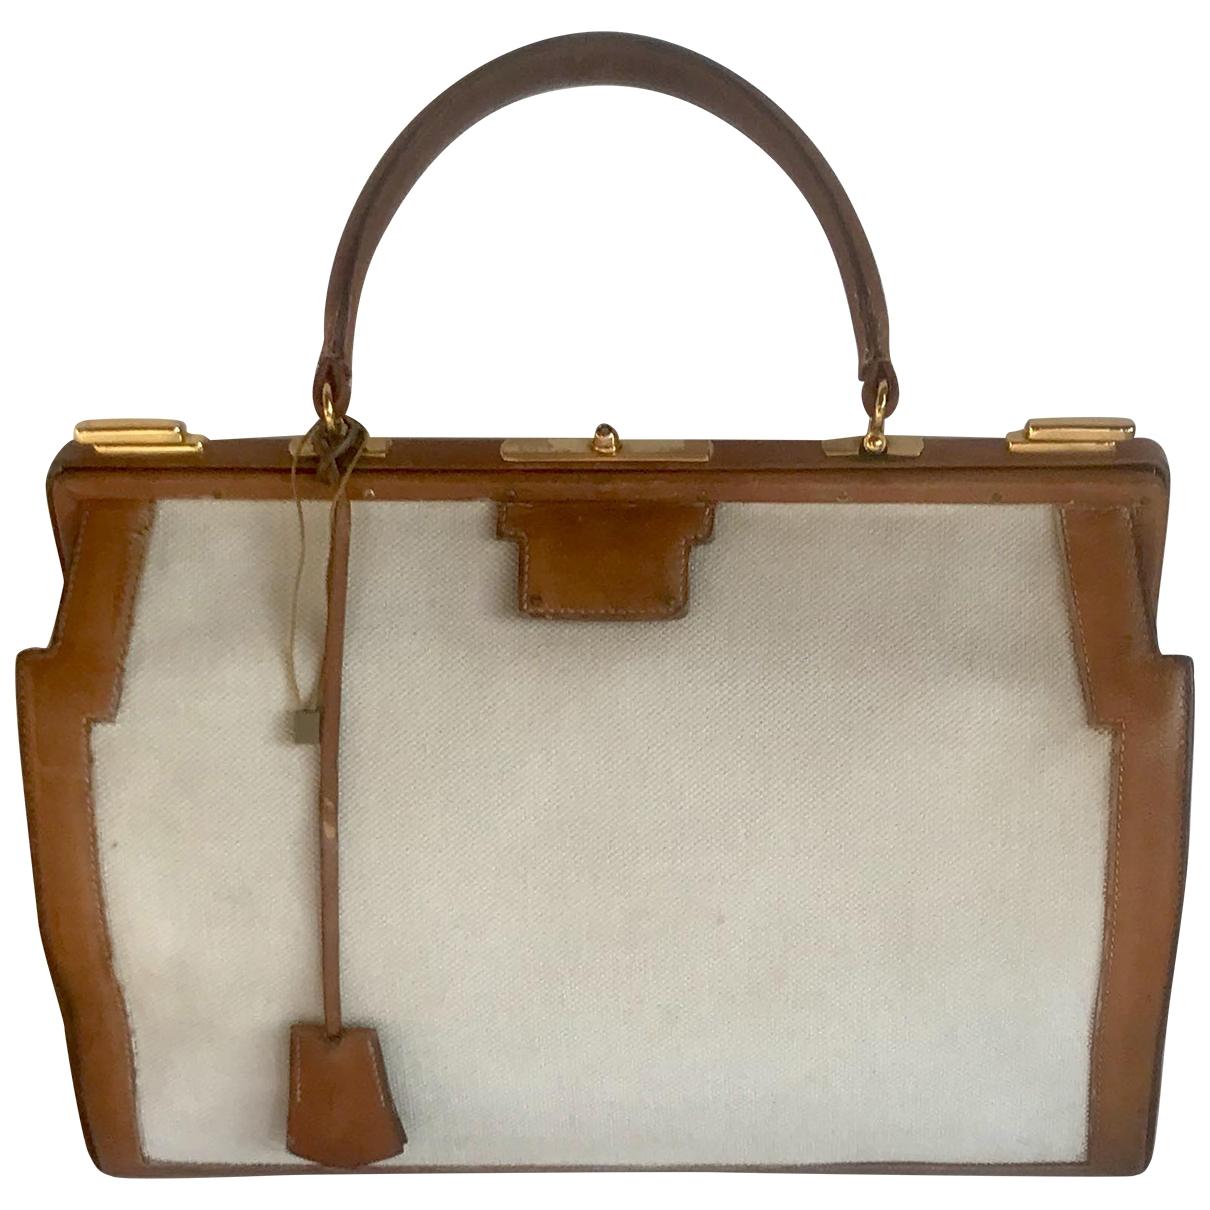 Hermès \N Ecru Leather handbag for Women \N